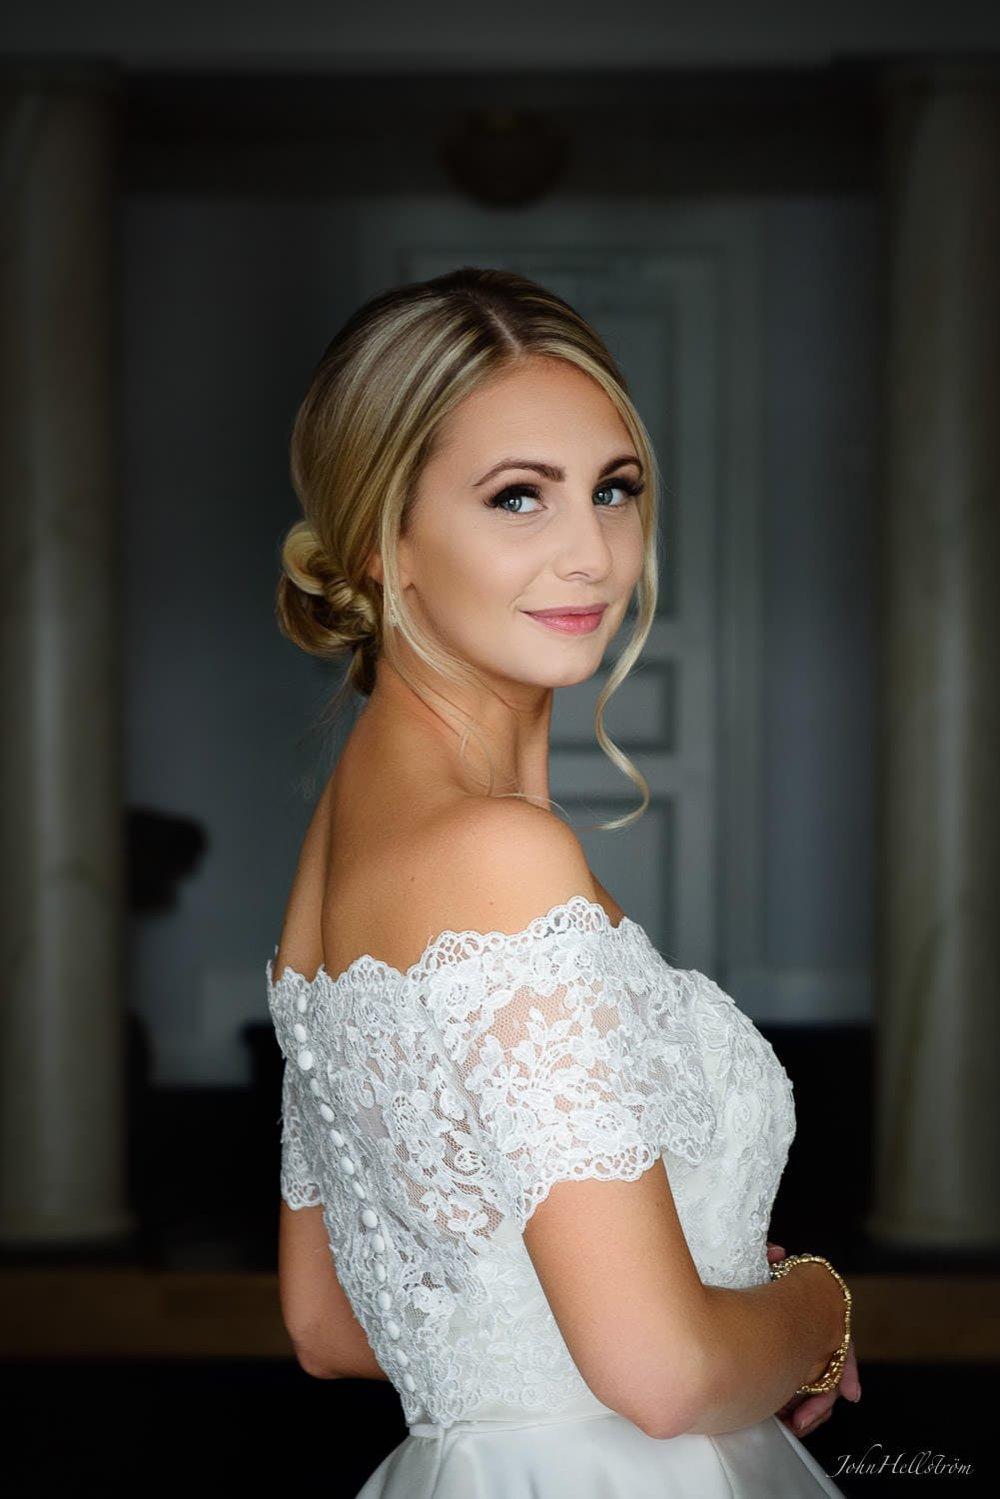 Portrait Photographer In Stockholm - Wedding Photographer | Hellstrom